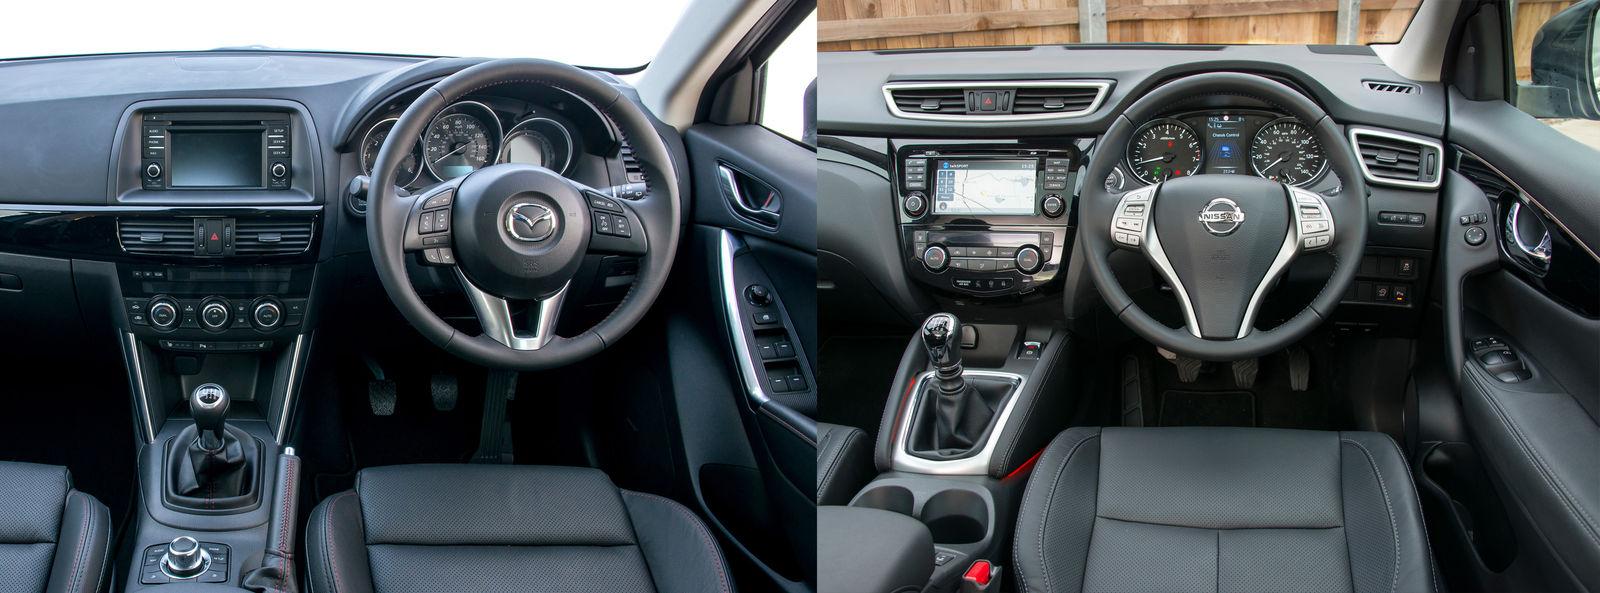 Nissan Qashqai Vs Mazda Cx 5 Side By Side Uk Comparison